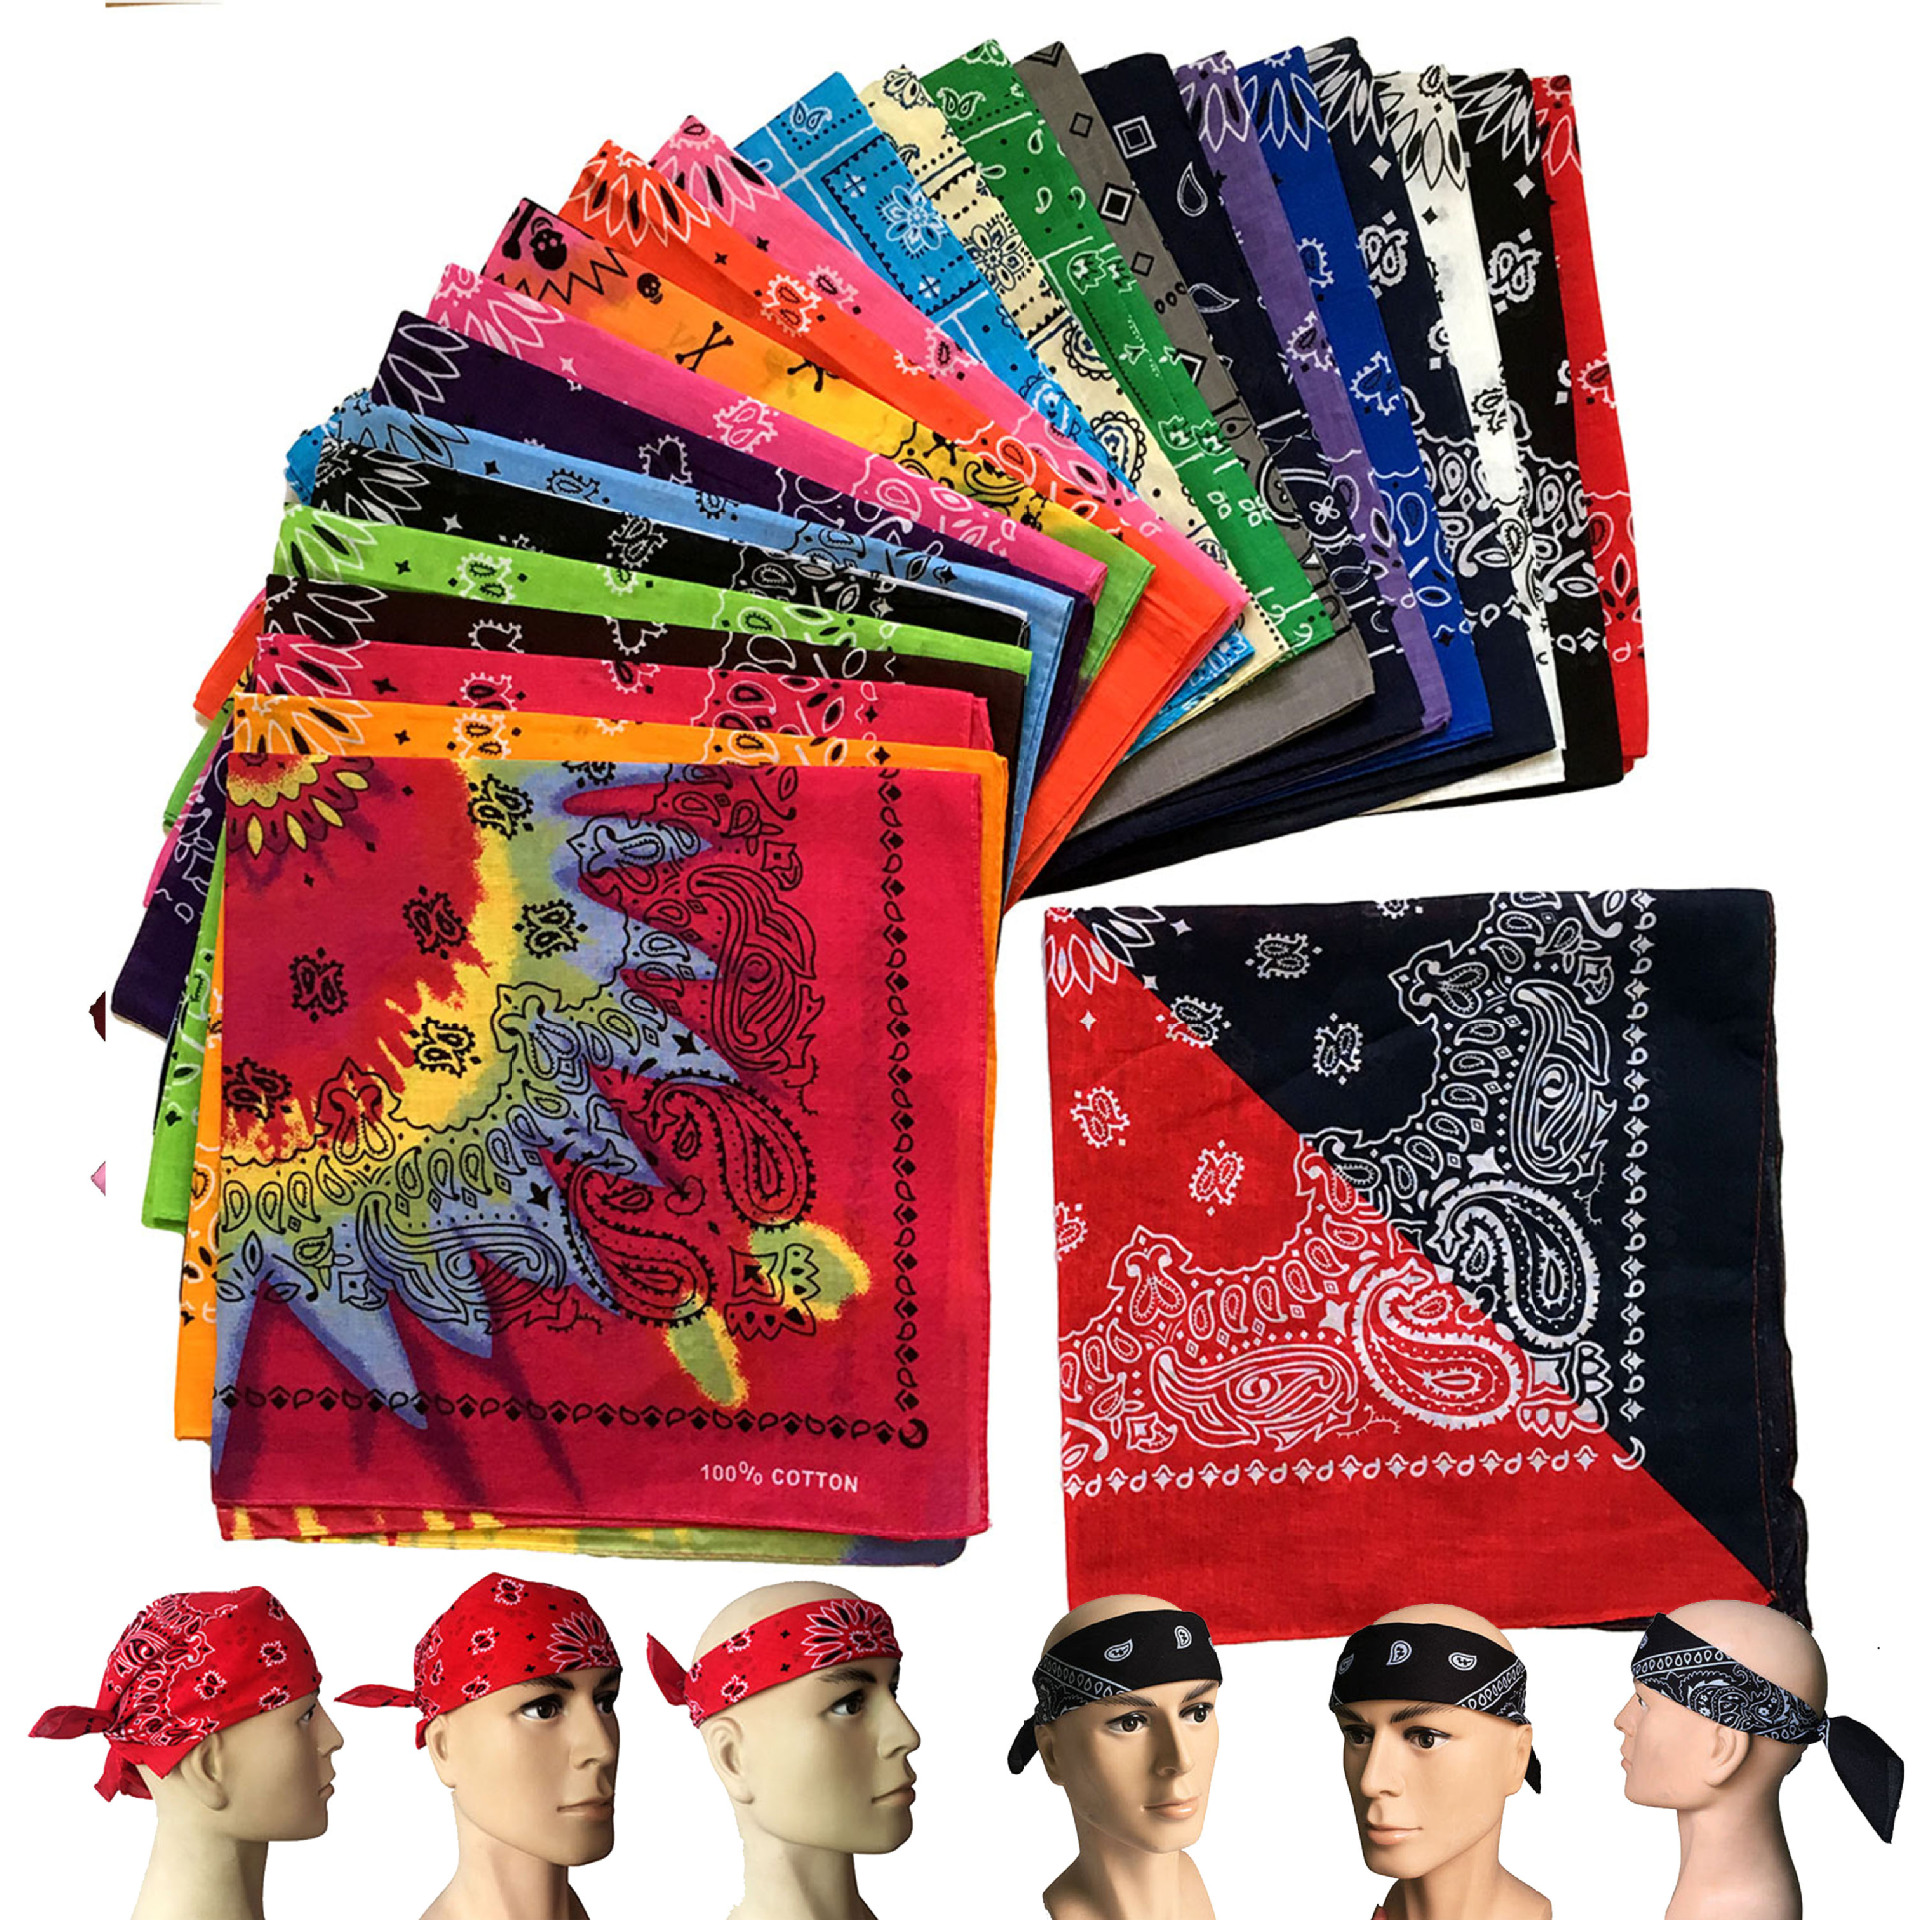 New 55CM*55CM 100% Cotton Black And White Red Skull And Paisley Bandana For Mens/Boys/Womens/Girls